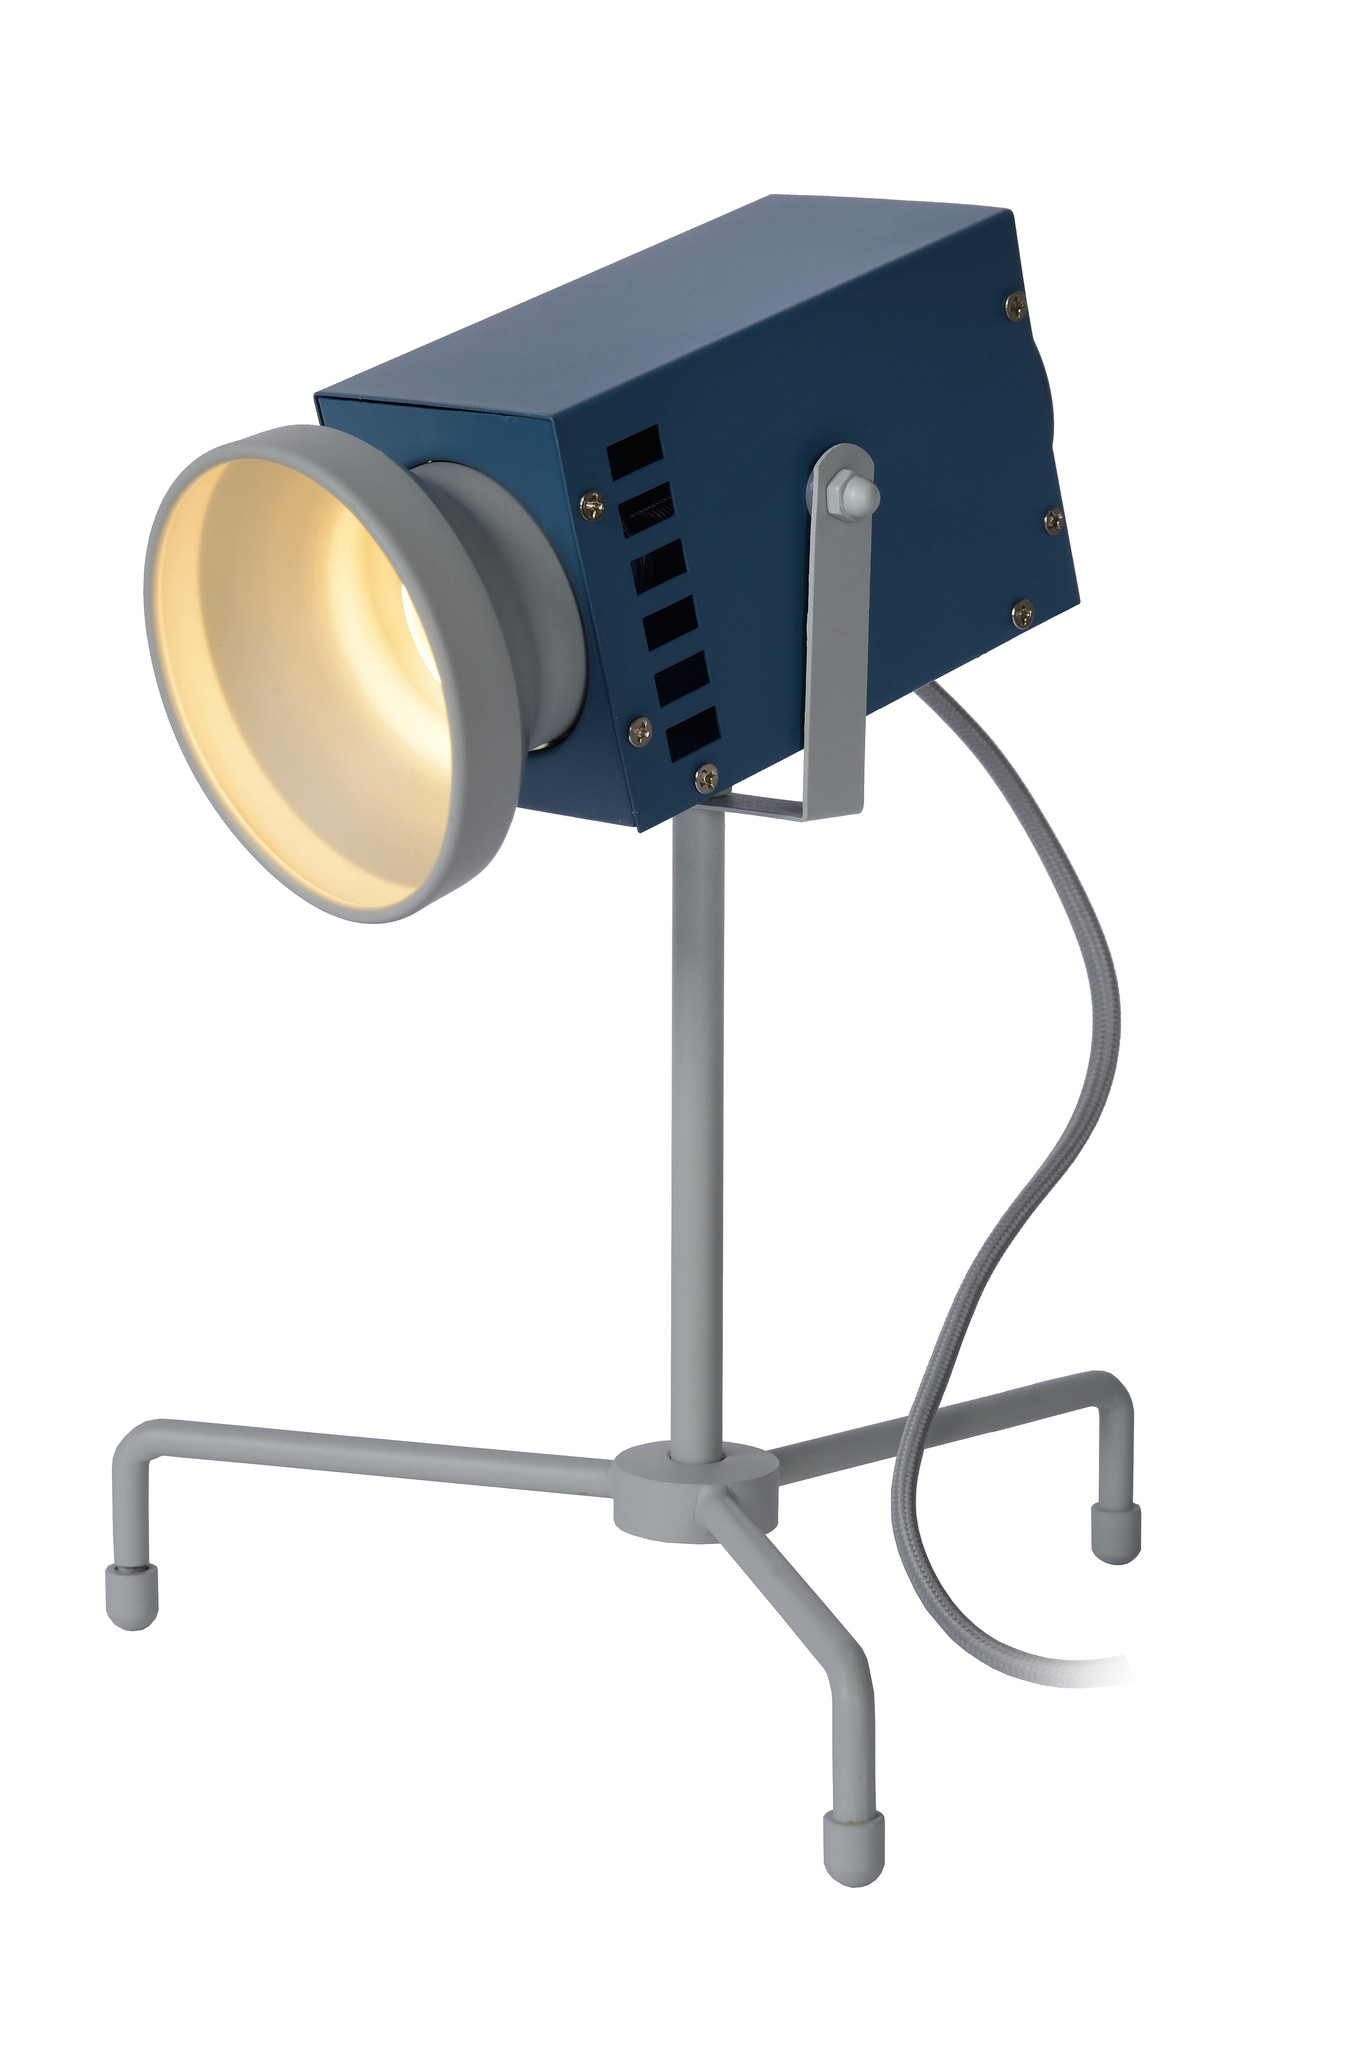 Lucide BEAMER Tafellamp Kinder-Blauw-LED-3W-3000K-Staal